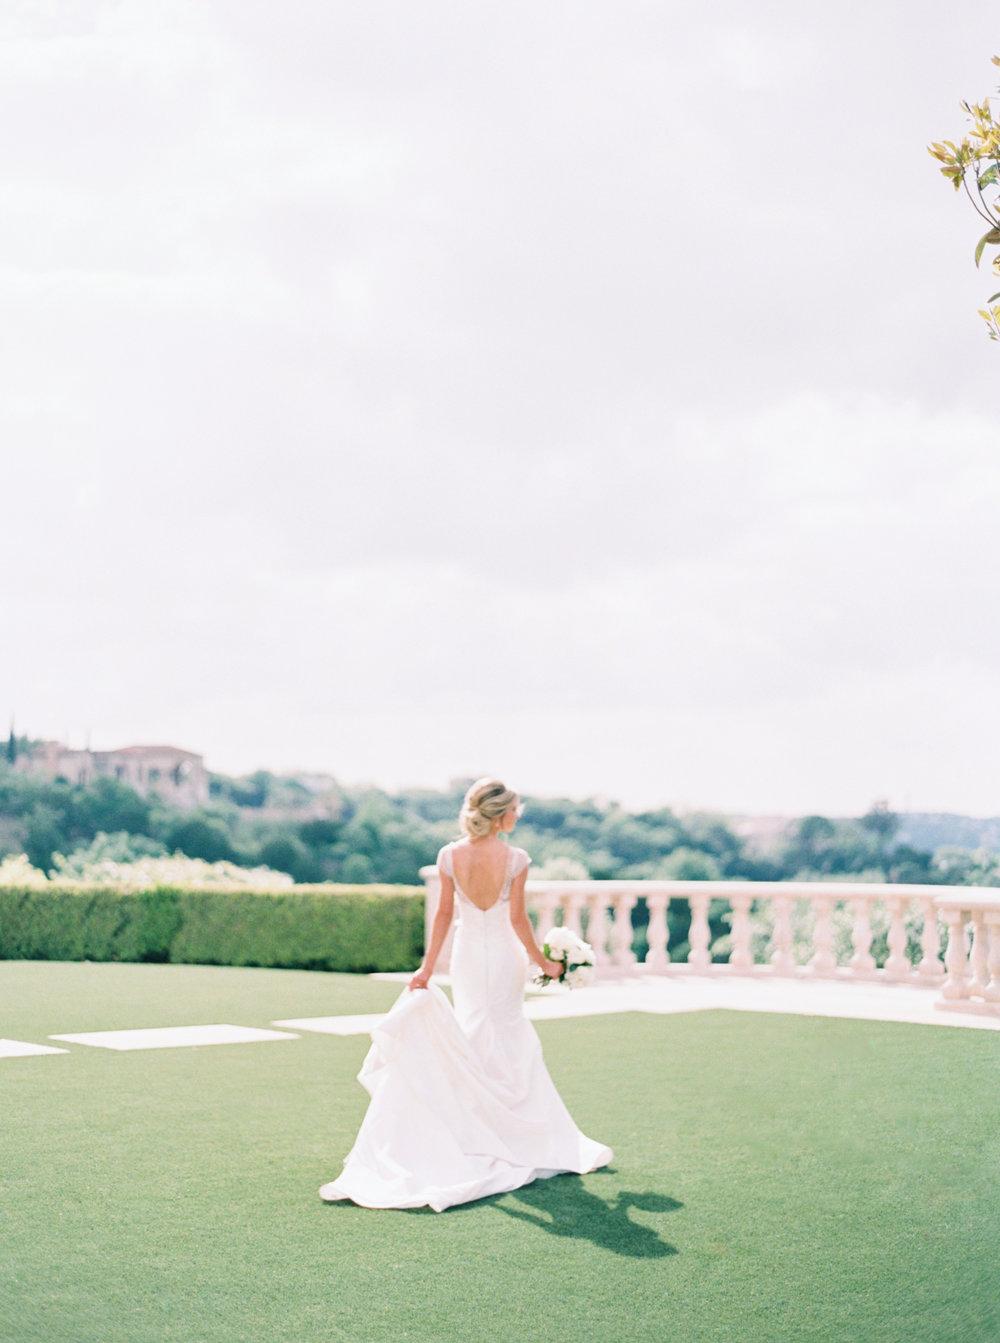 jenna-mcelroy-bridal-portraits-a-southern-tradition-9